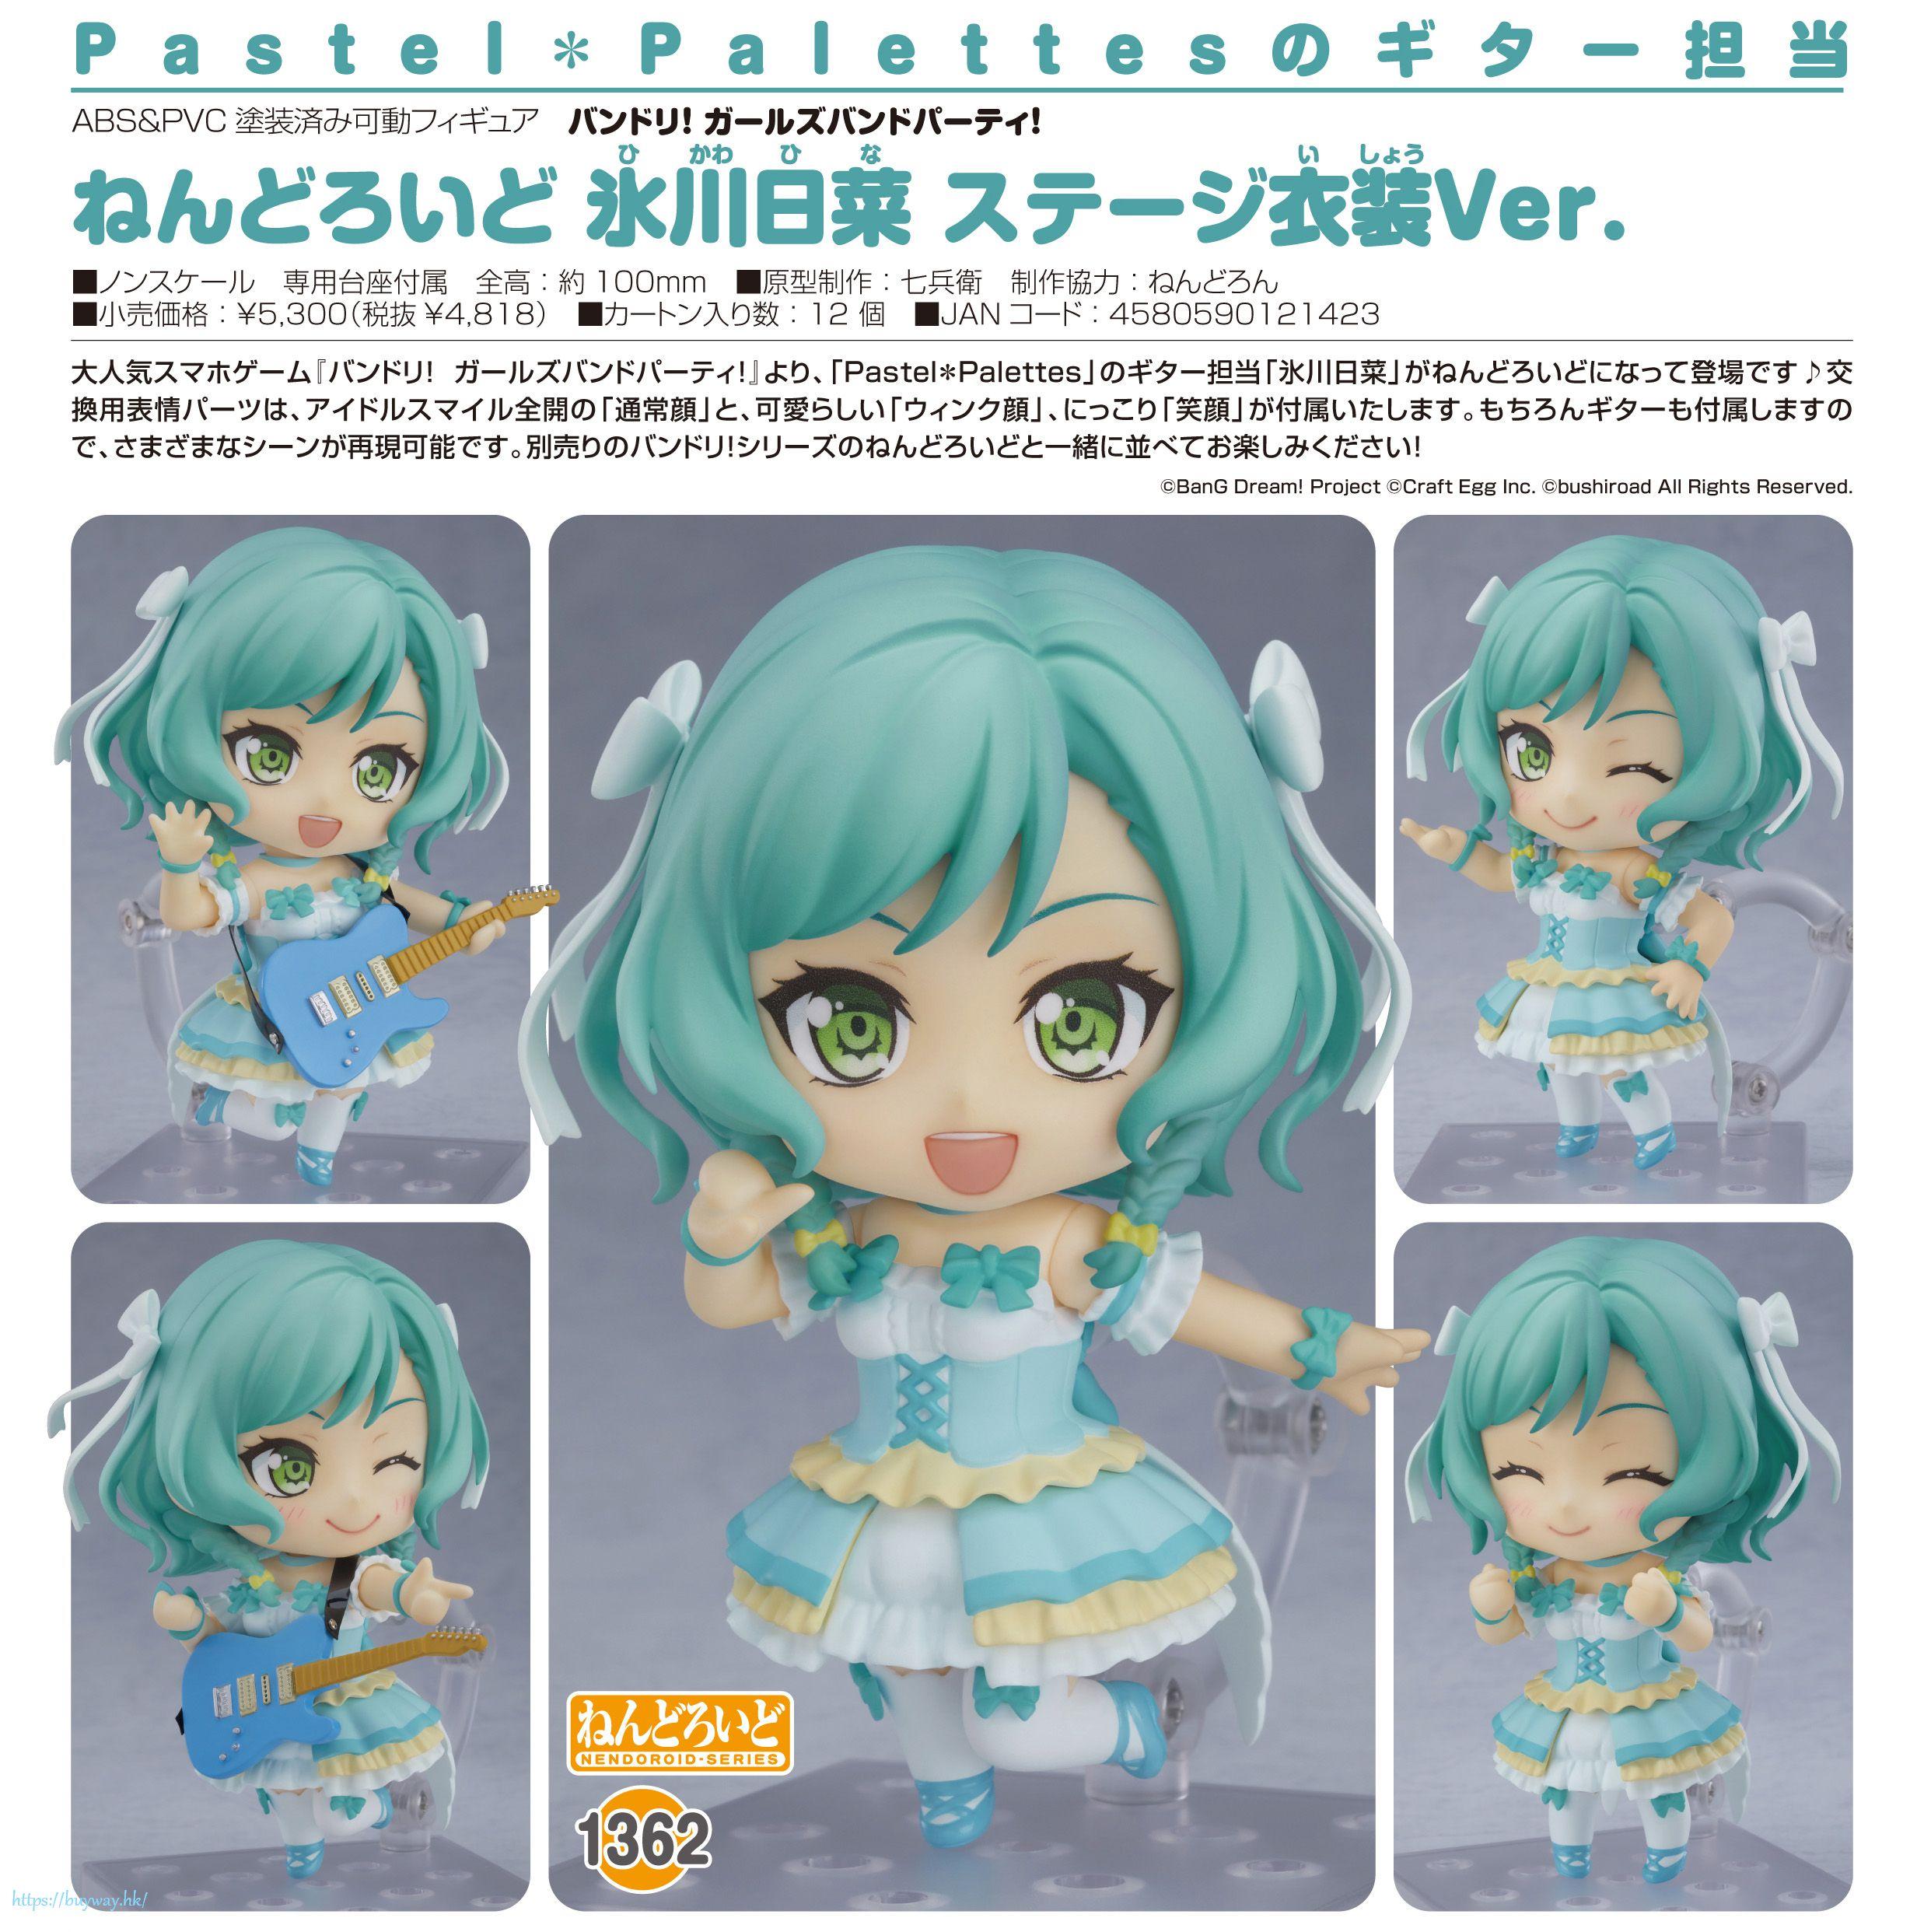 BanG Dream! 「冰川日菜」舞台服裝 Q版 黏土人 Nendoroid Hikawa Hina Stage Costume Ver.【BanG Dream!】